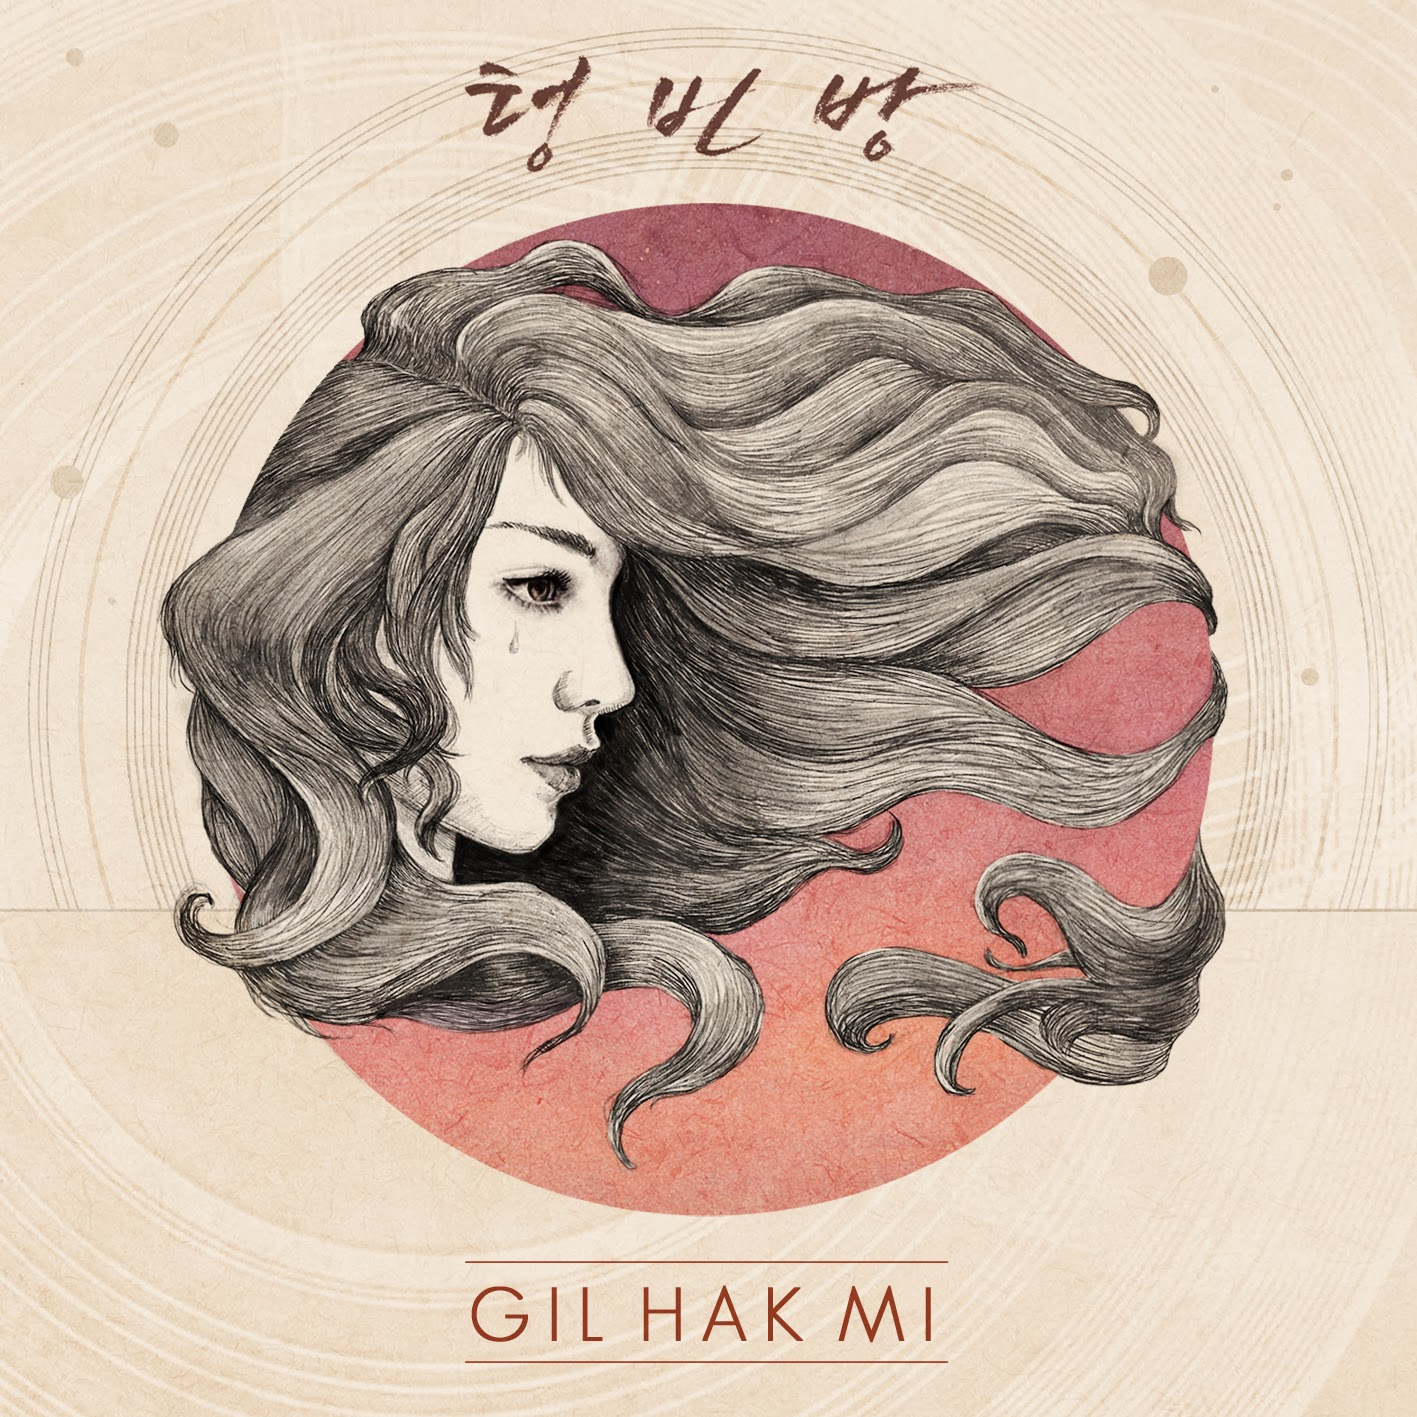 Gil Hak Mi - Empty room (텅 빈 방) Lyrics